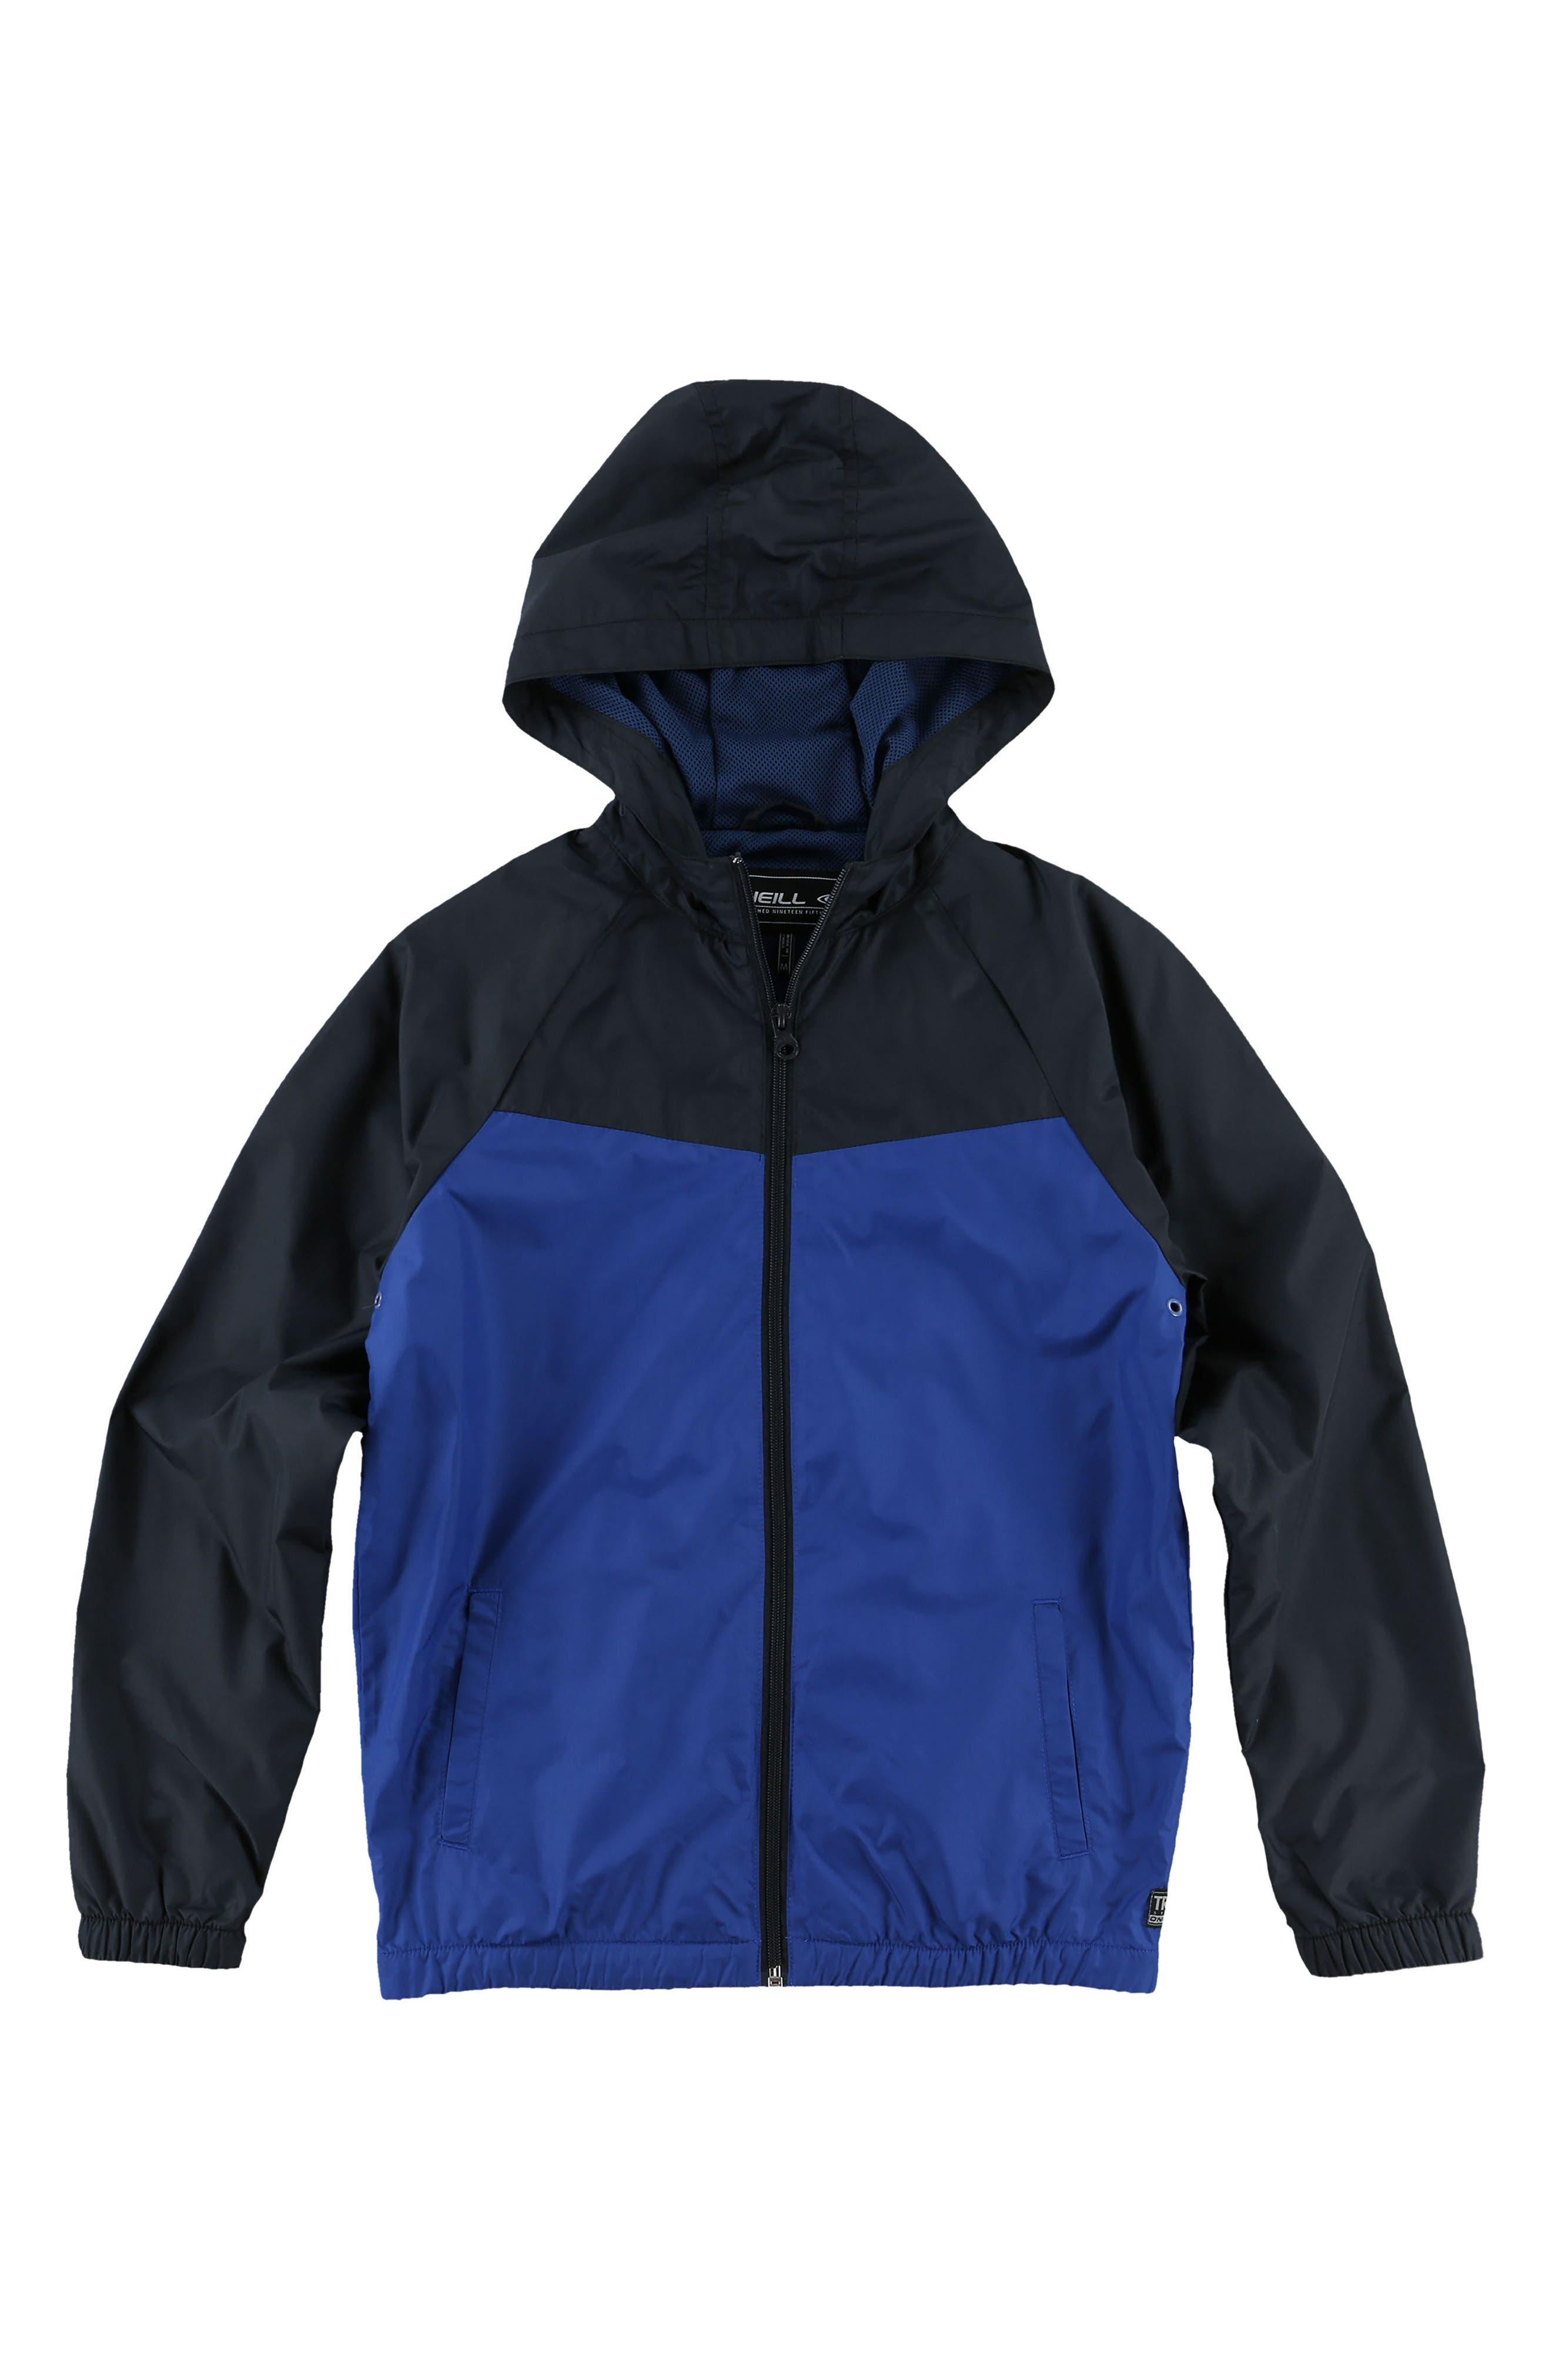 Alternate Image 1 Selected - O'Neill Traveler Packable Windbreaker Jacket (Big Boys)